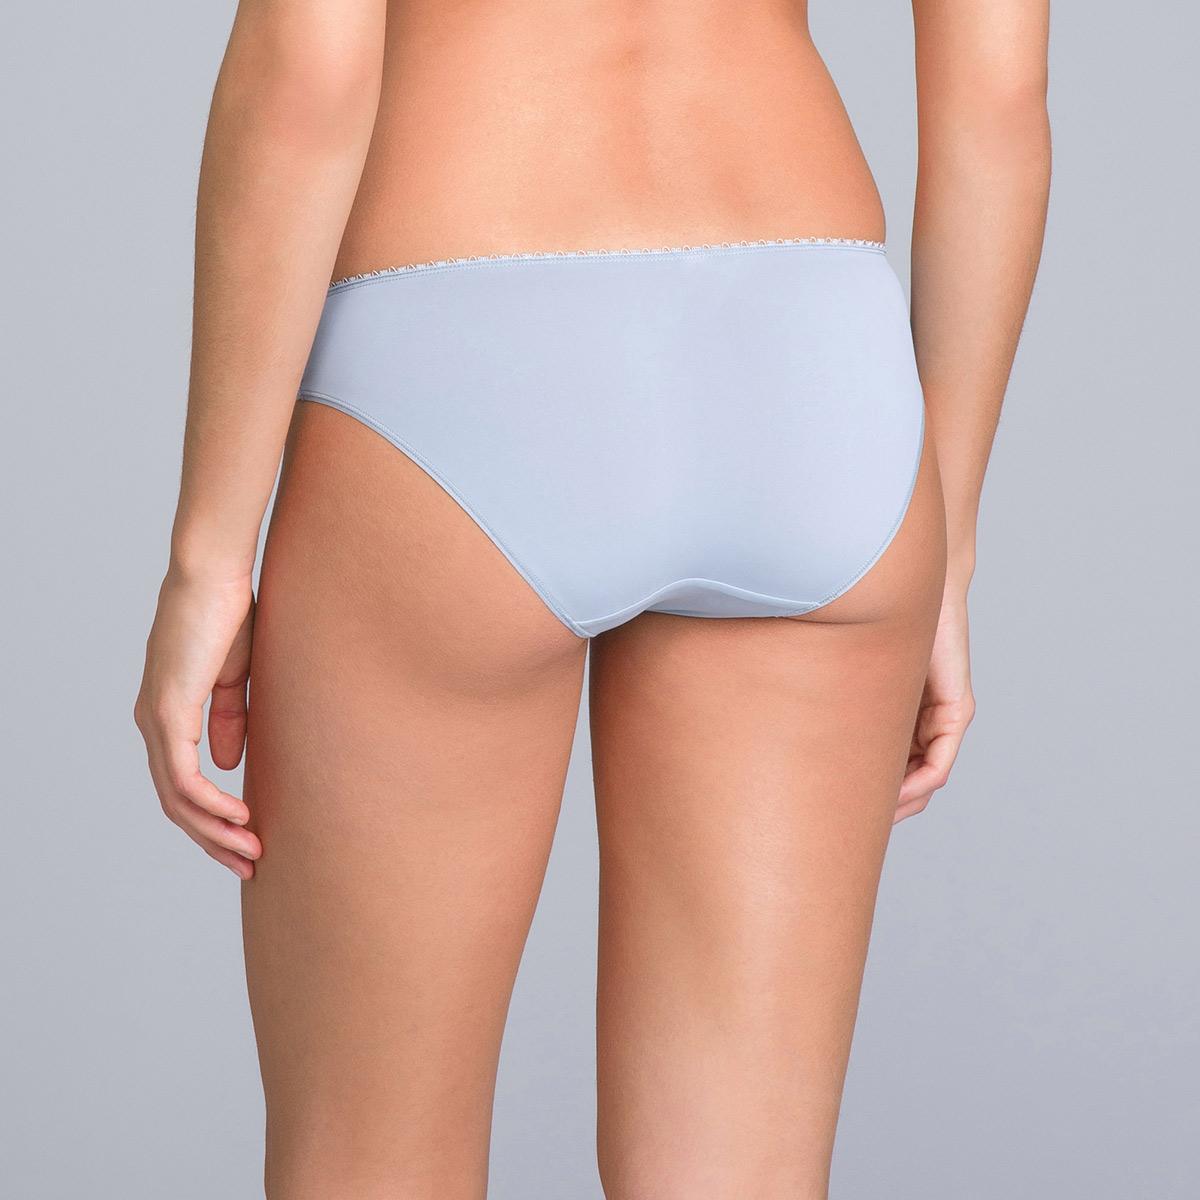 Bikini Knickers in Lace & Microfibre Blue Fog Print - Flower Elegance - PLAYTEX